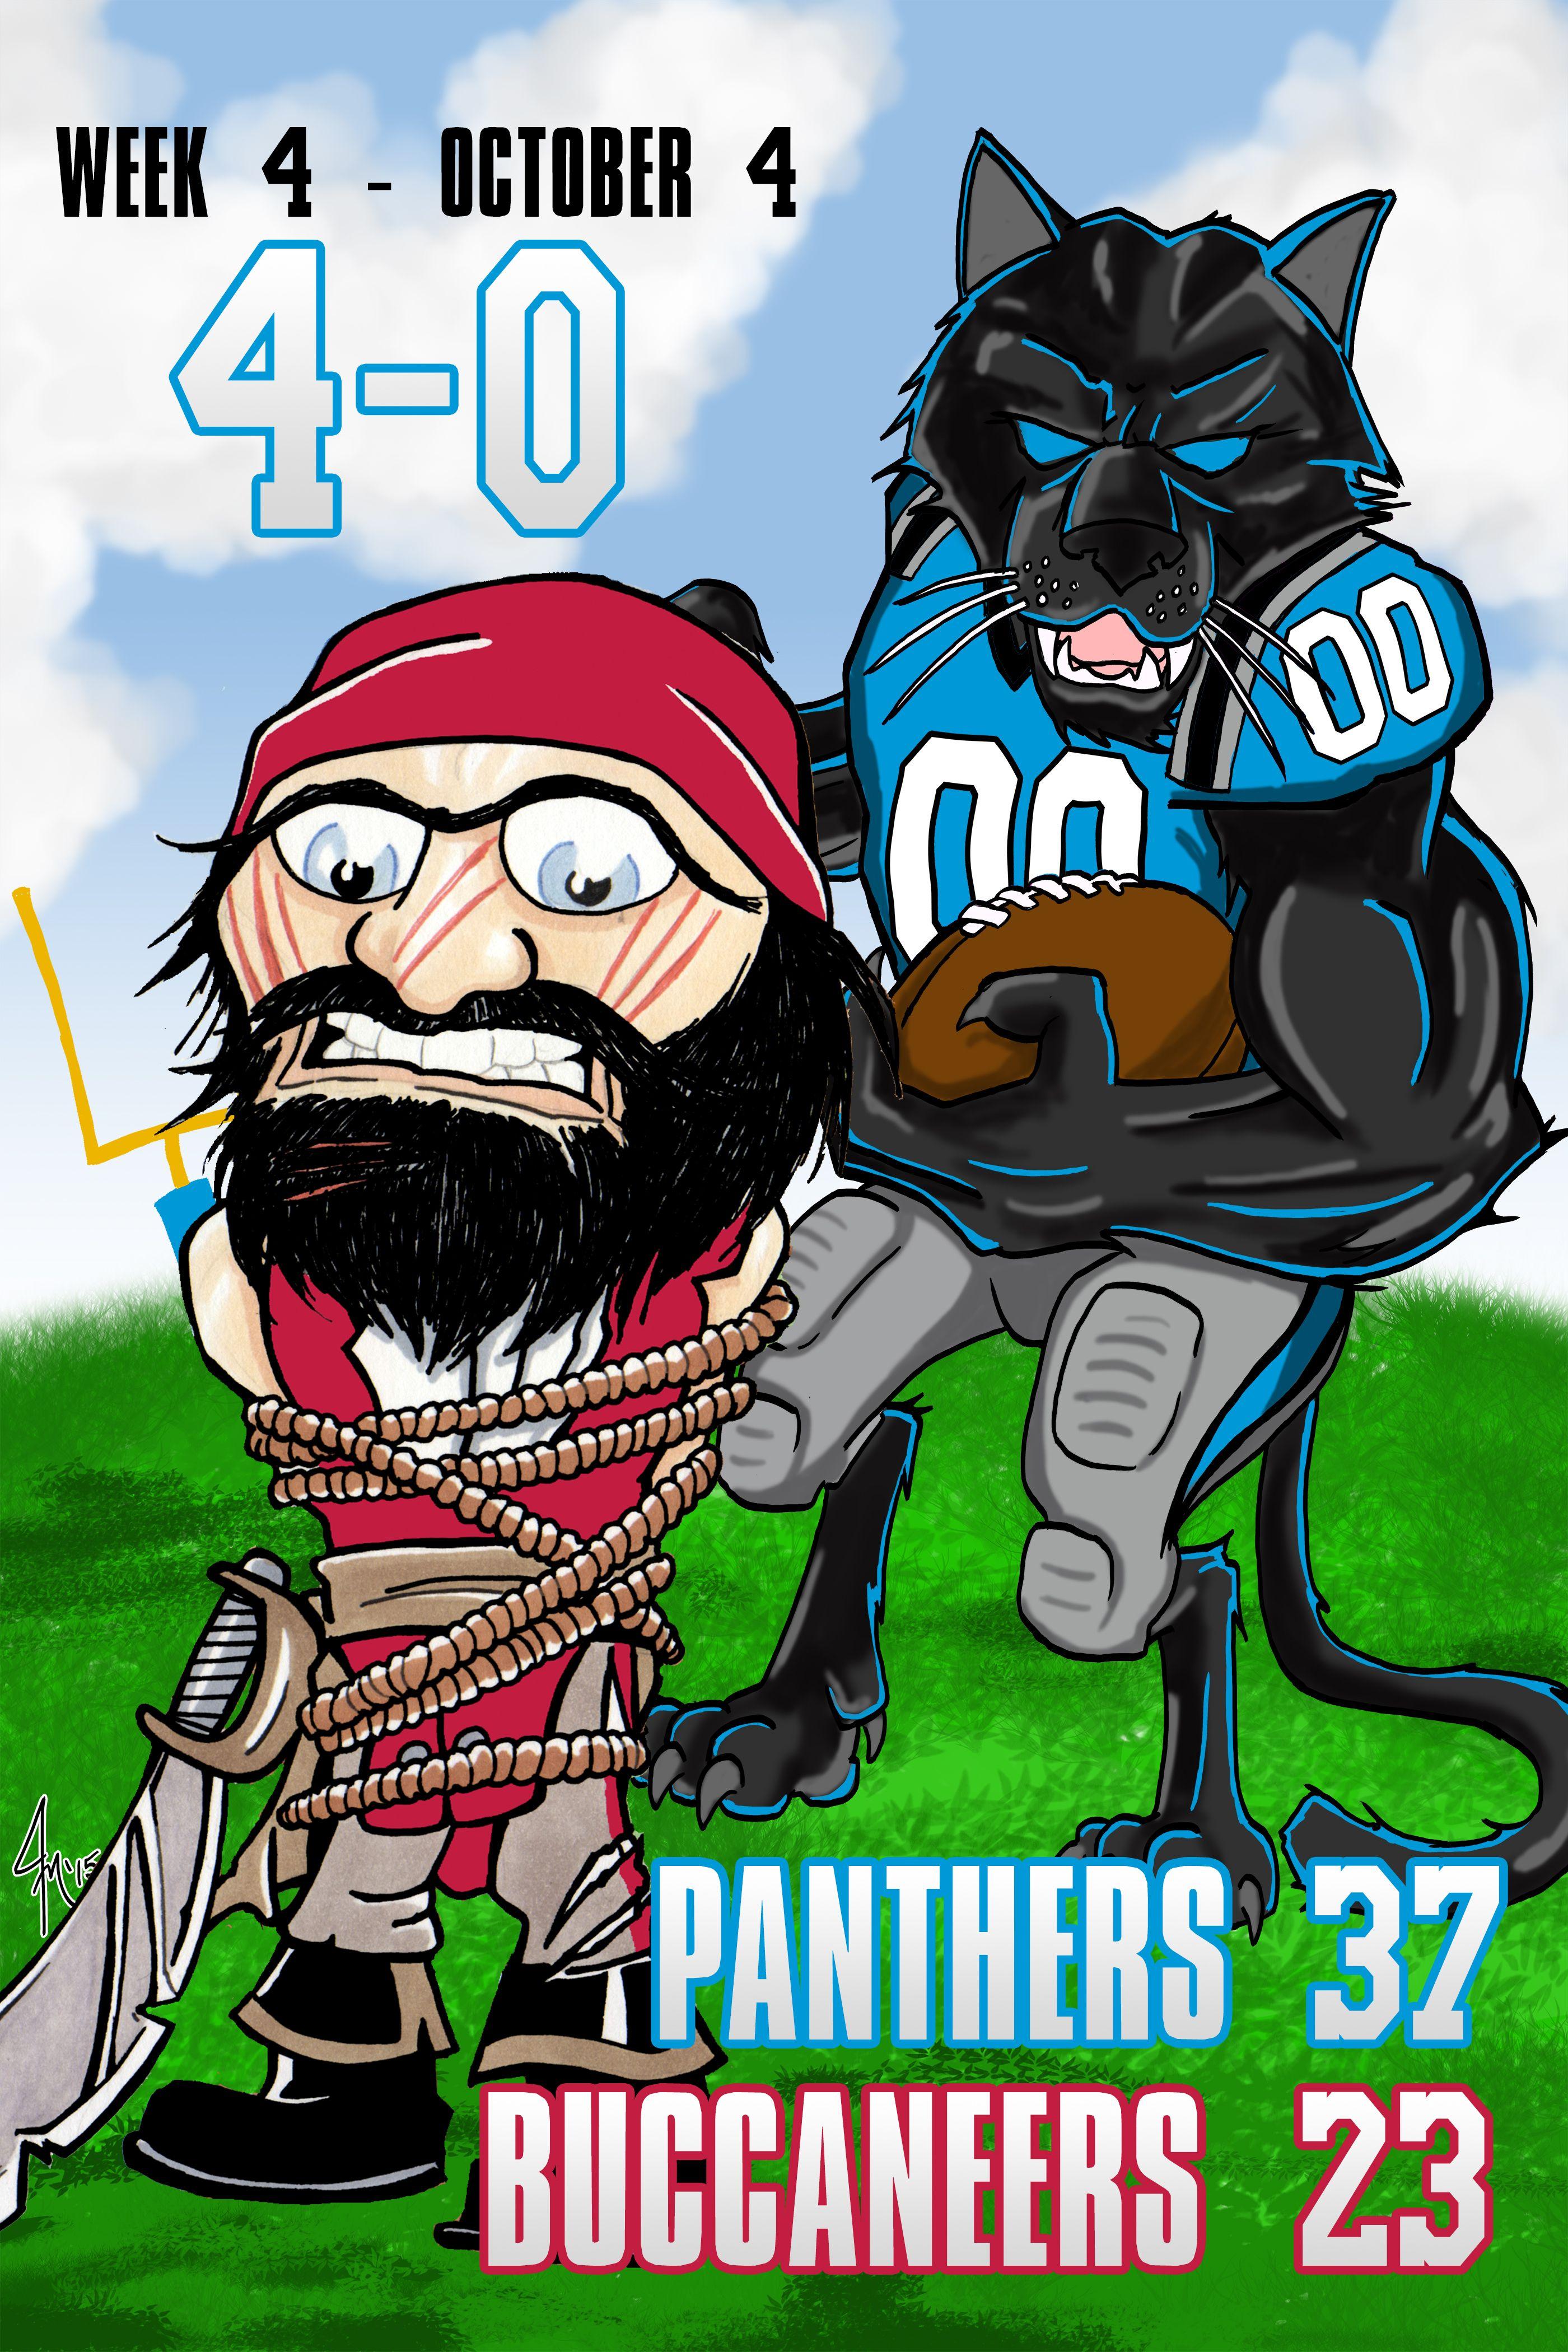 Carolina Panther Defeat Tampa Bay Buccaneers Carolina Panthers Panther Nation Panthers